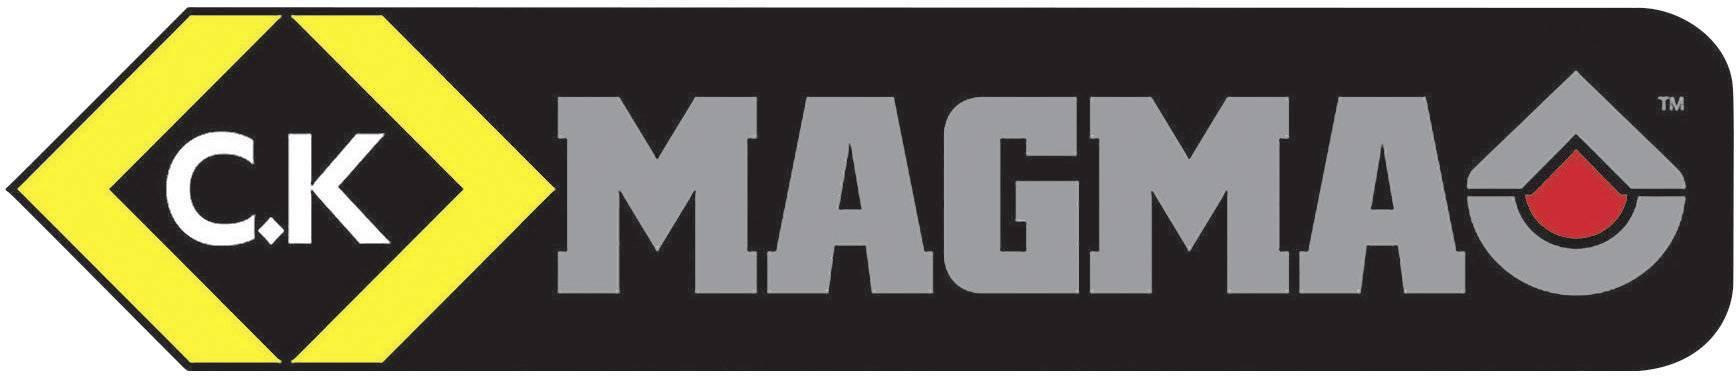 C.K. Magma